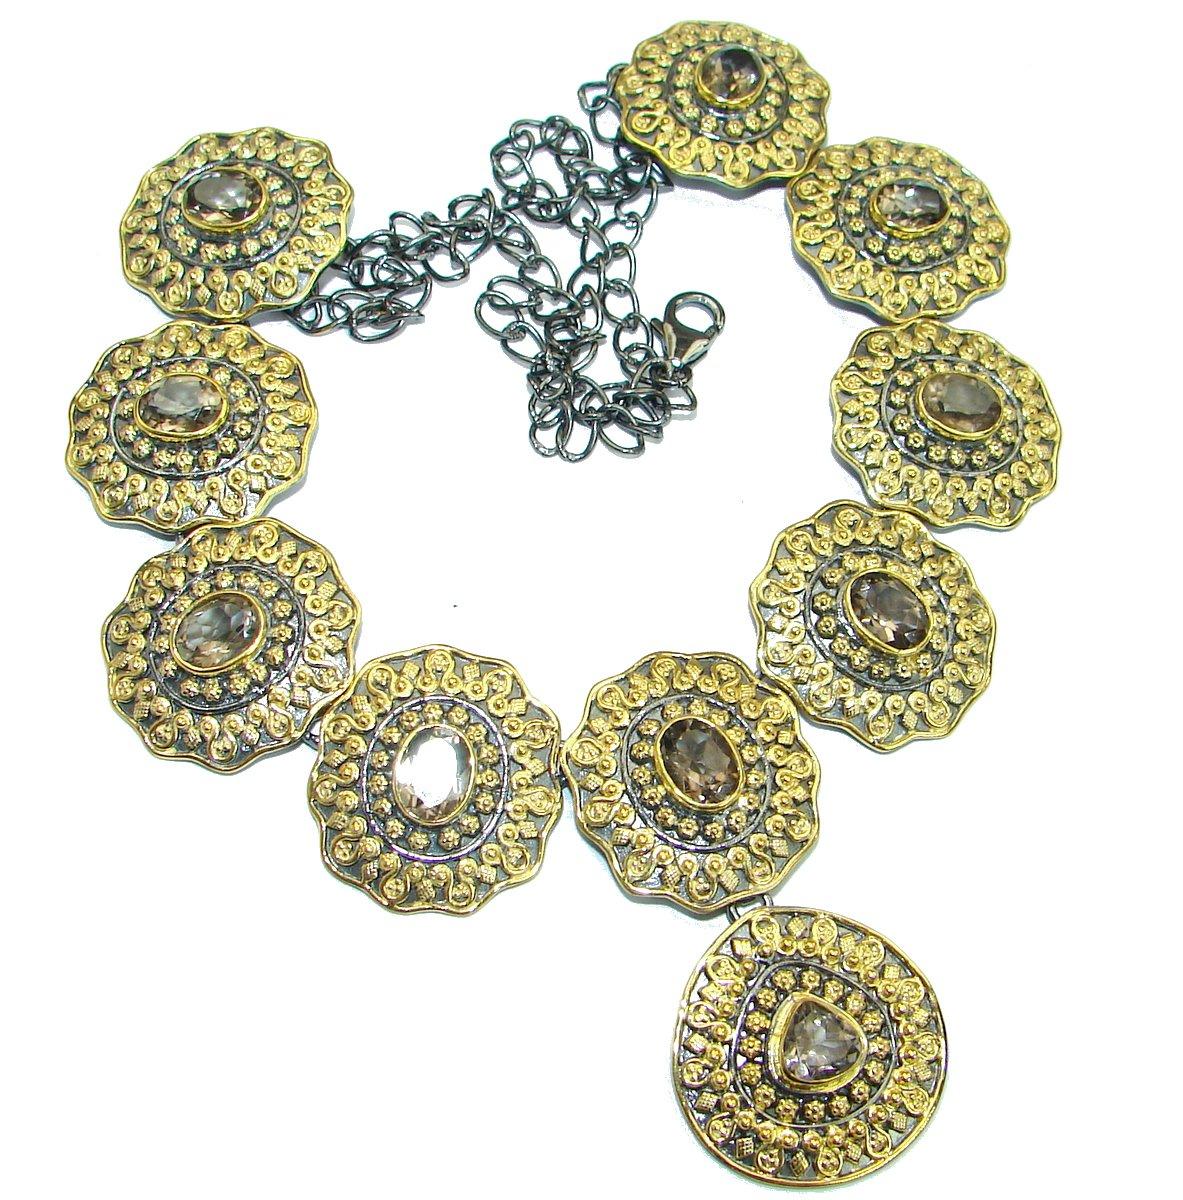 SilverFury Quartz Women 925 Sterling Silver Necklace - FREE GIFT BOX